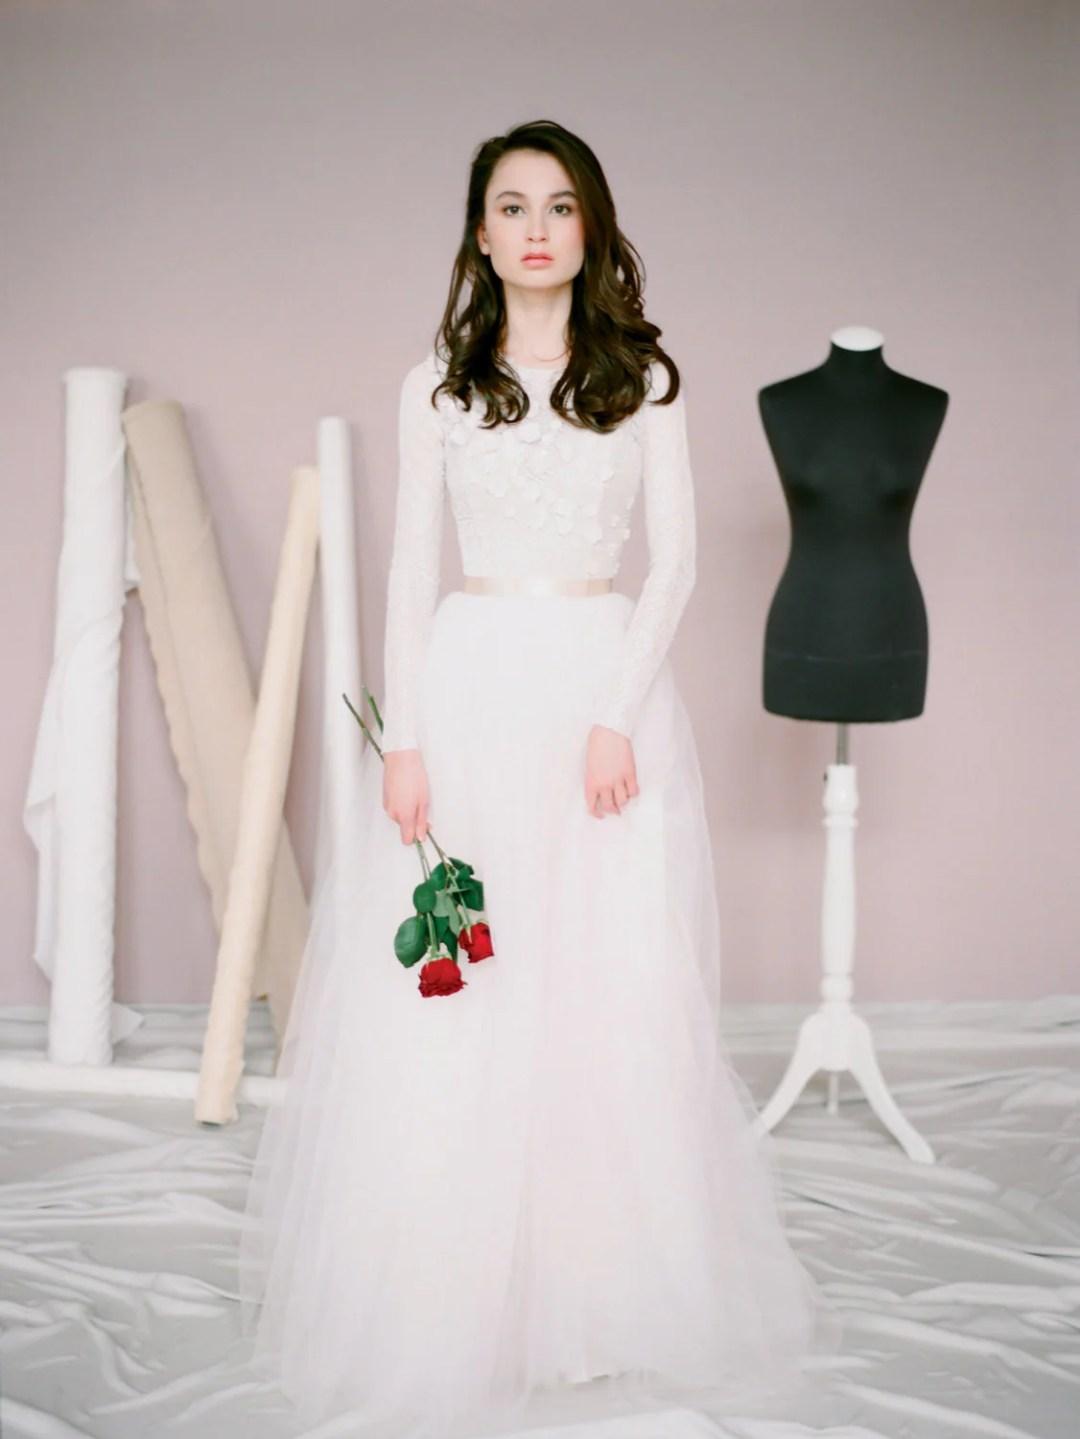 25 Modest Wedding Dresses with Long Sleeves - Long Sleeve Wedding Dress